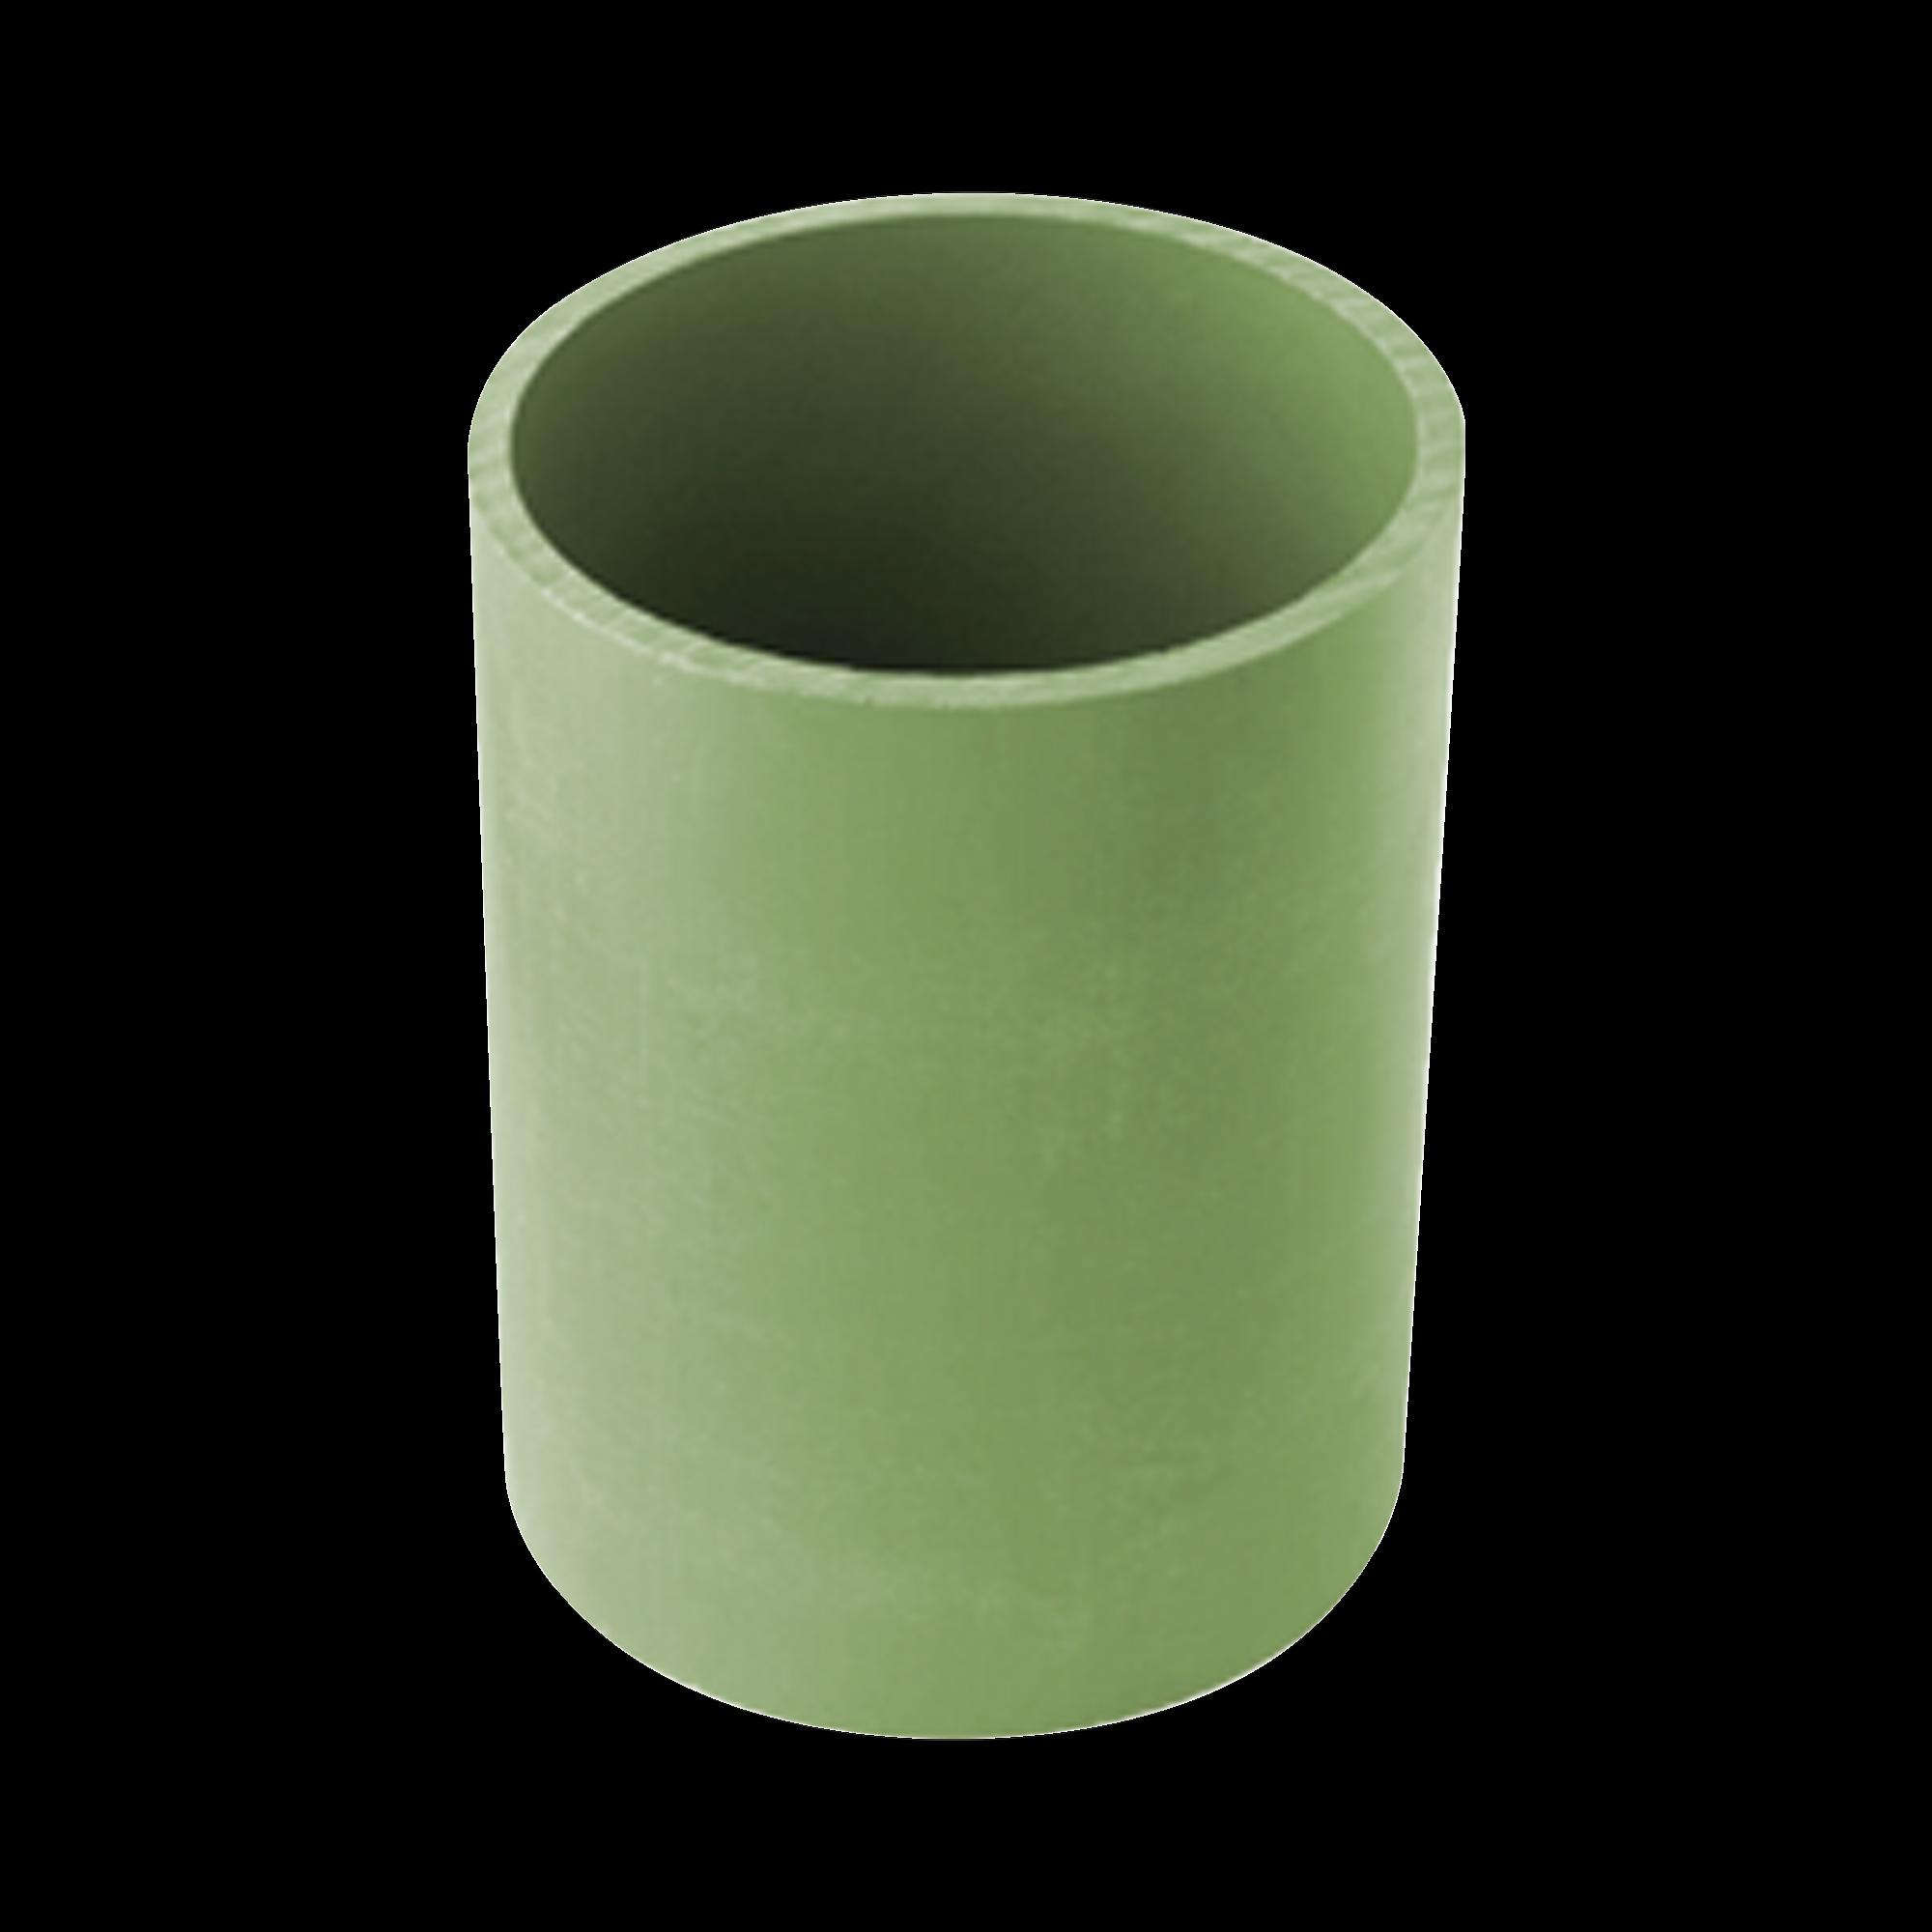 Cople para tubo PVC Conduit pesado de 2-1/2 (60 mm)